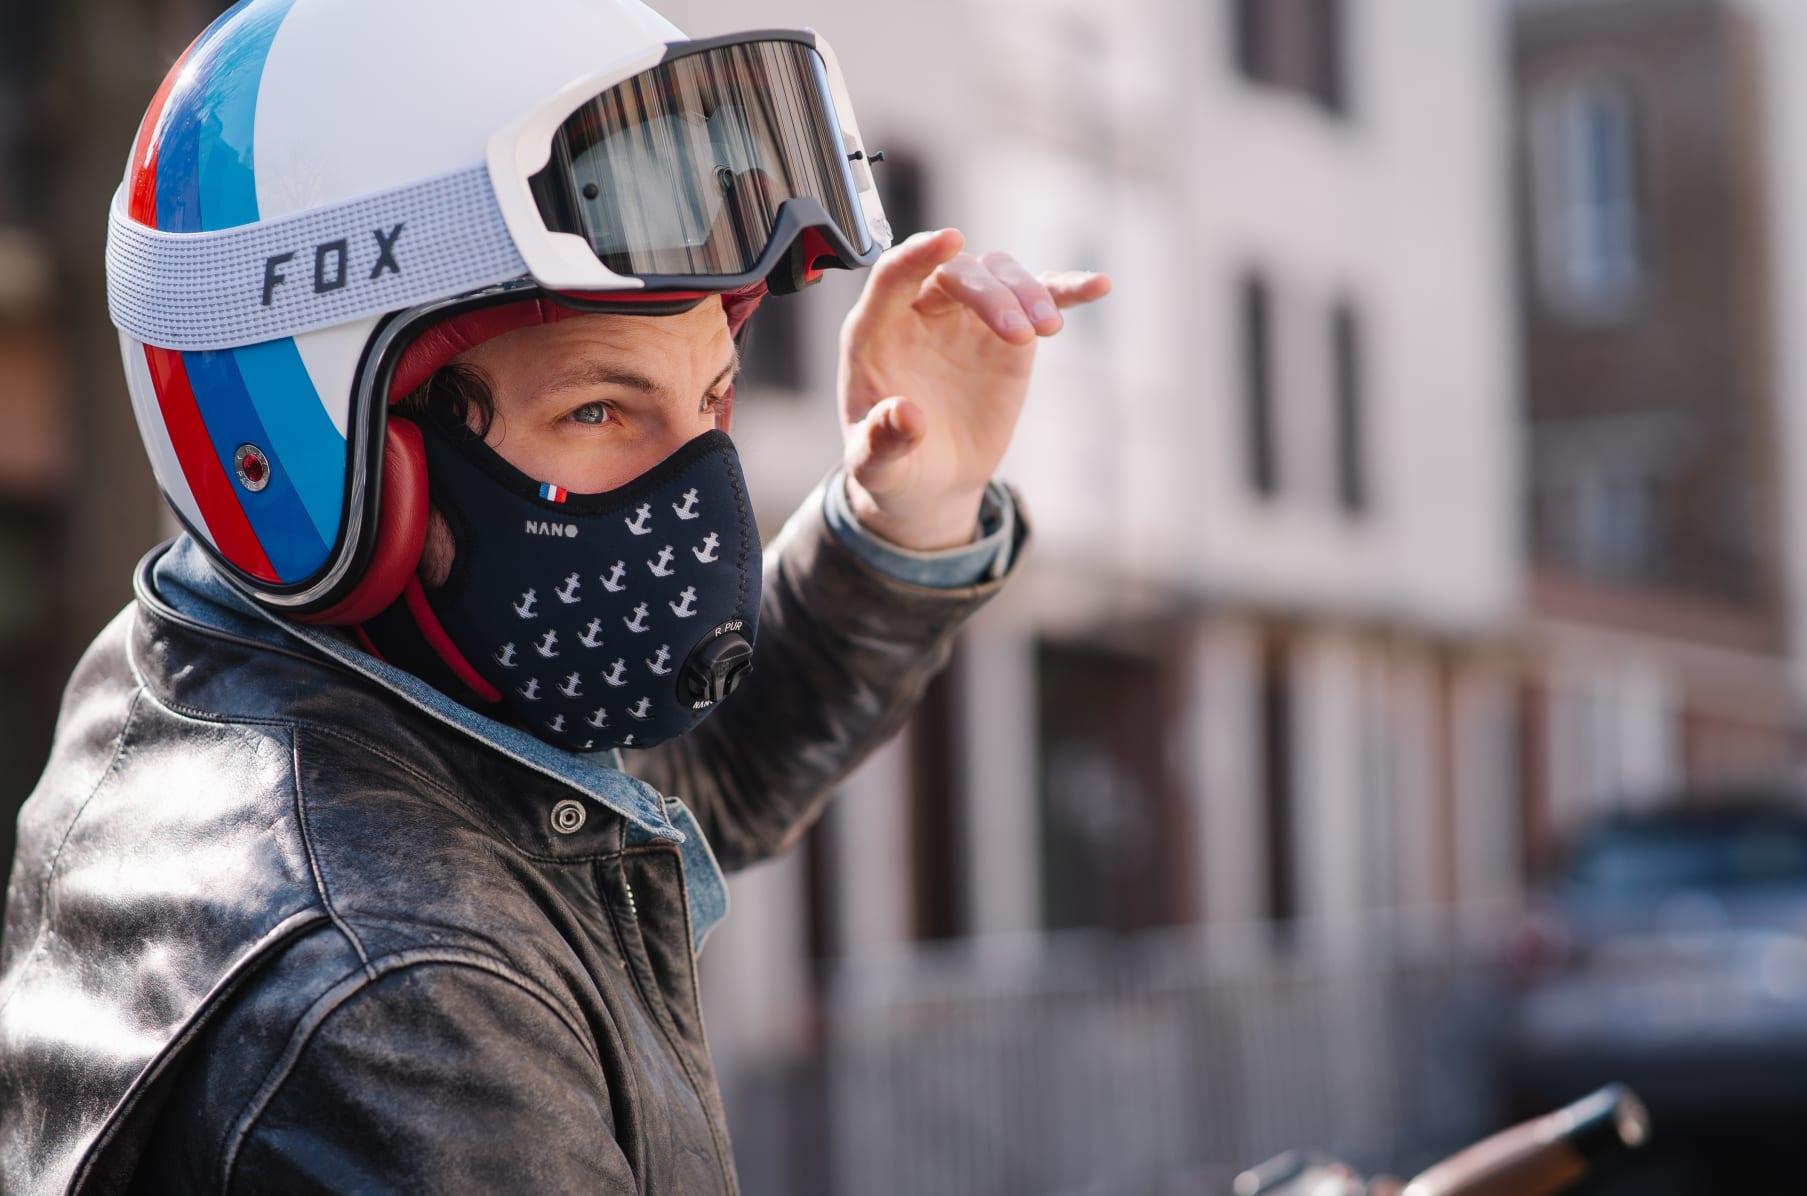 masque anti pollution r-pur nano